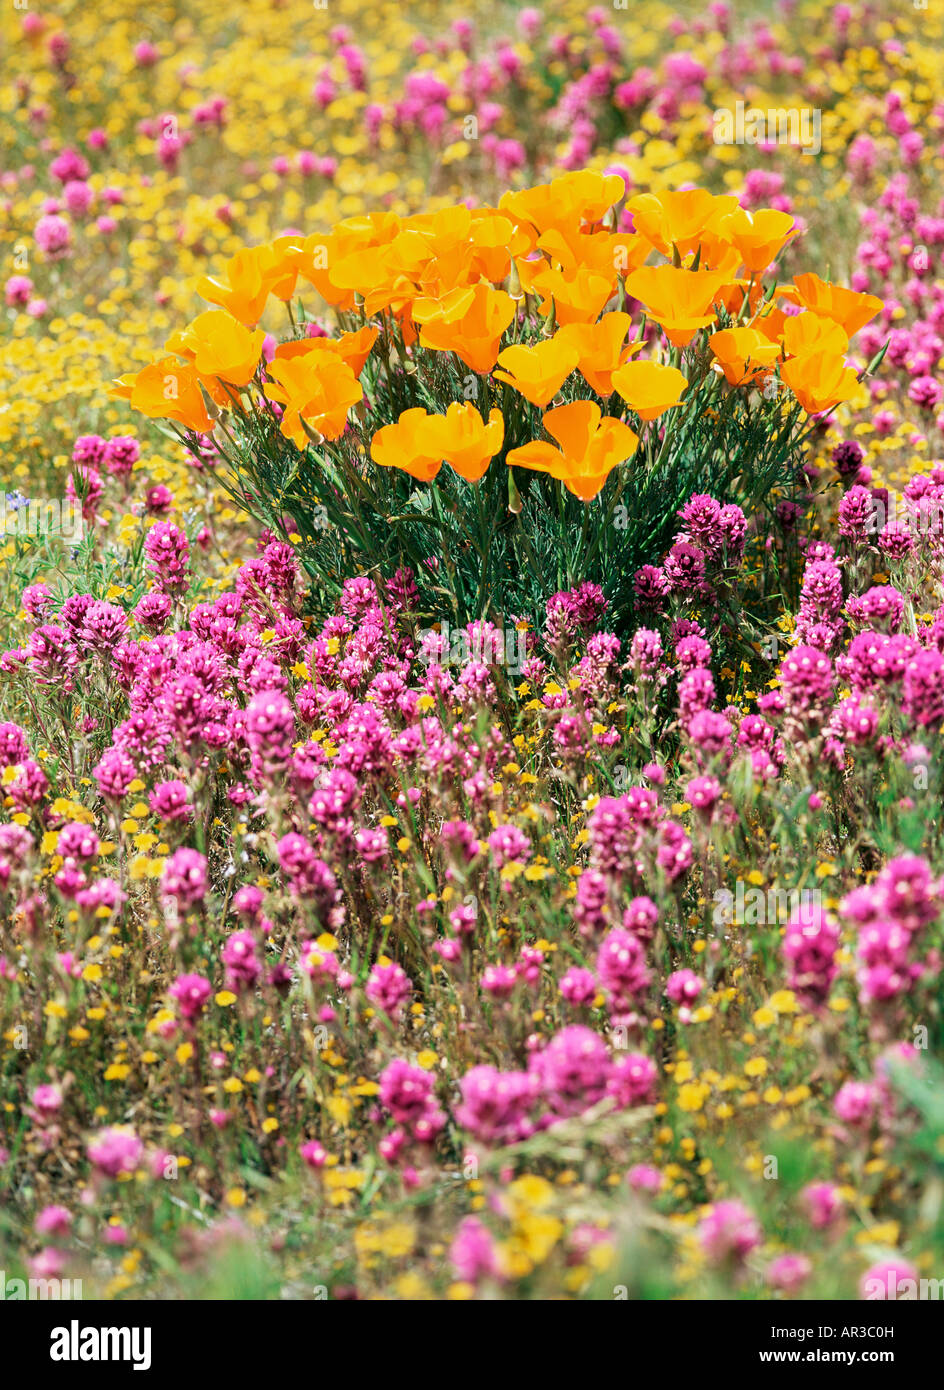 California poppy in the antelope valley - Stock Image